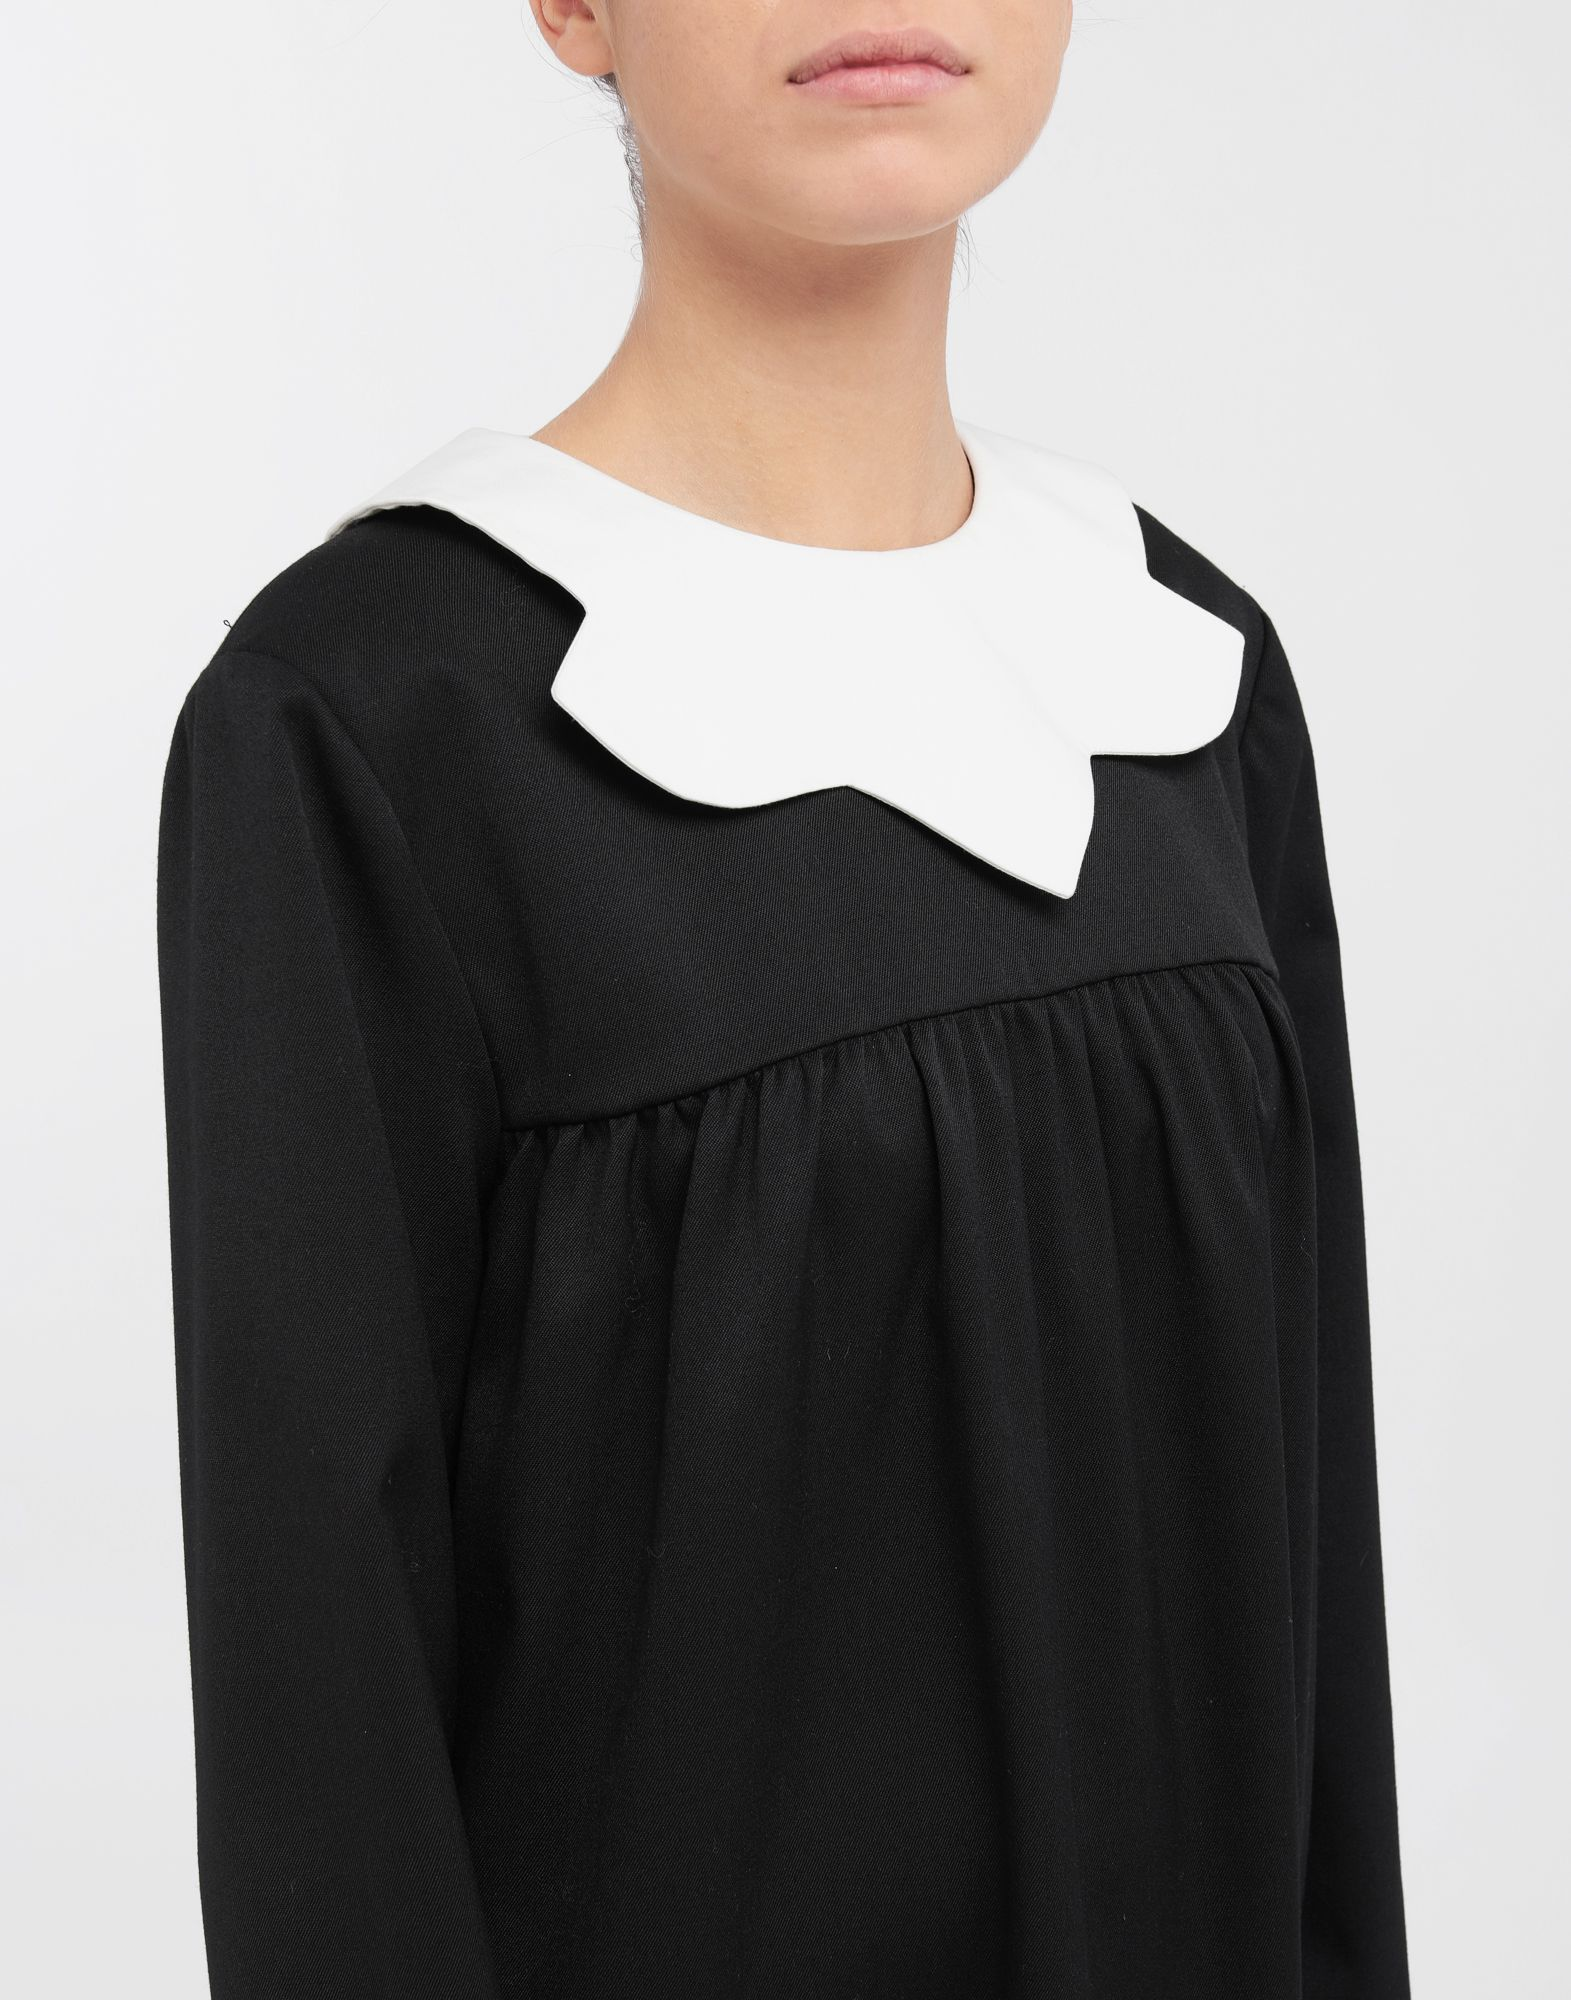 MM6 MAISON MARGIELA School uniform midi dress 3/4 length dress Woman a